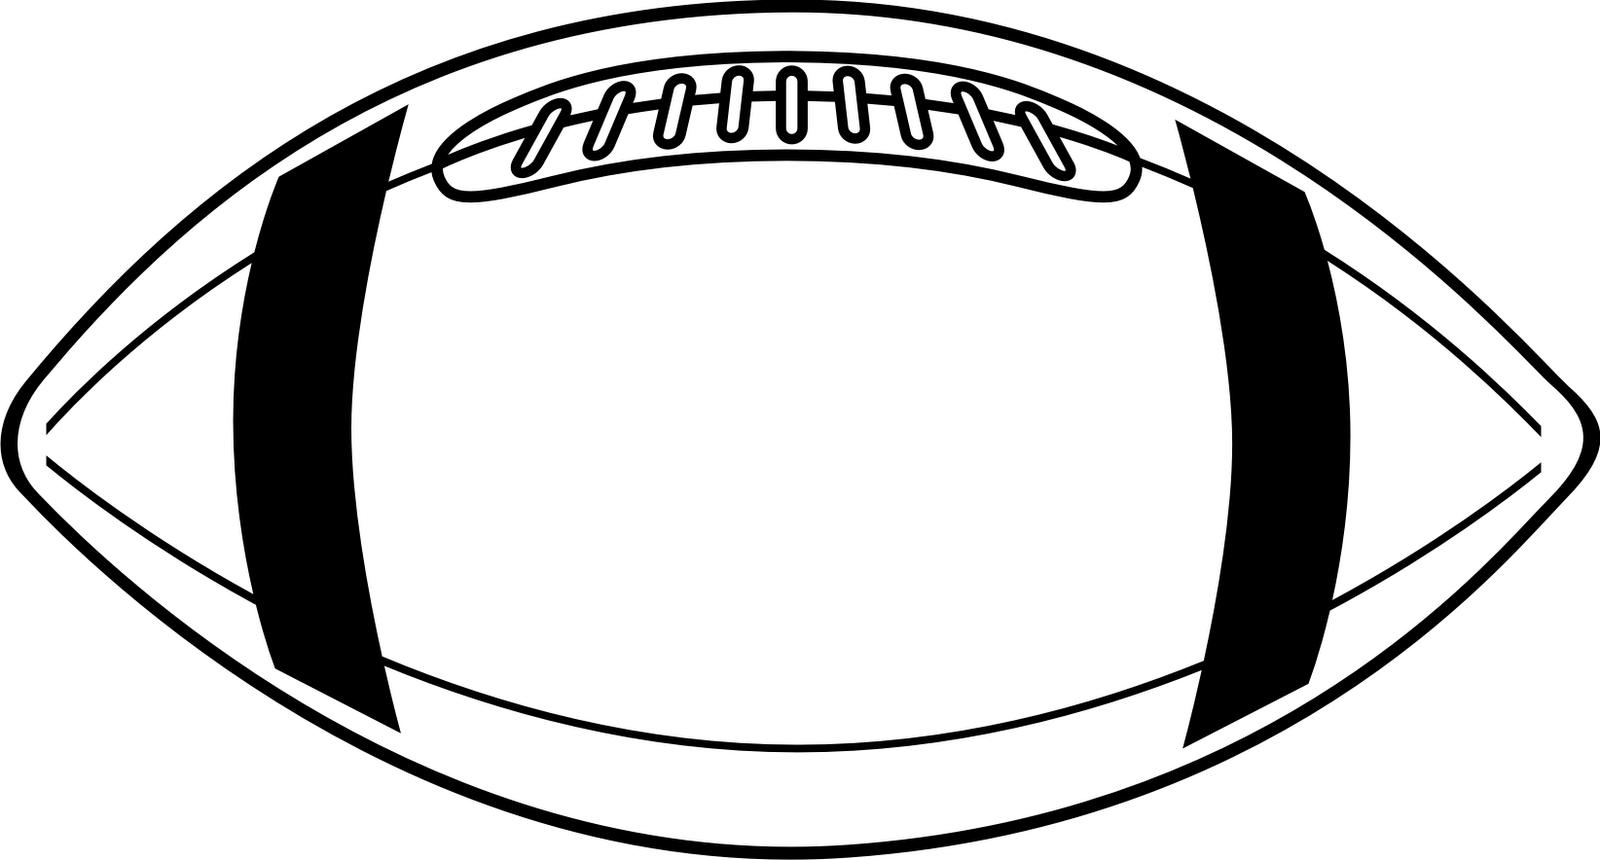 Clip Art Football Goal Post Clipart Library